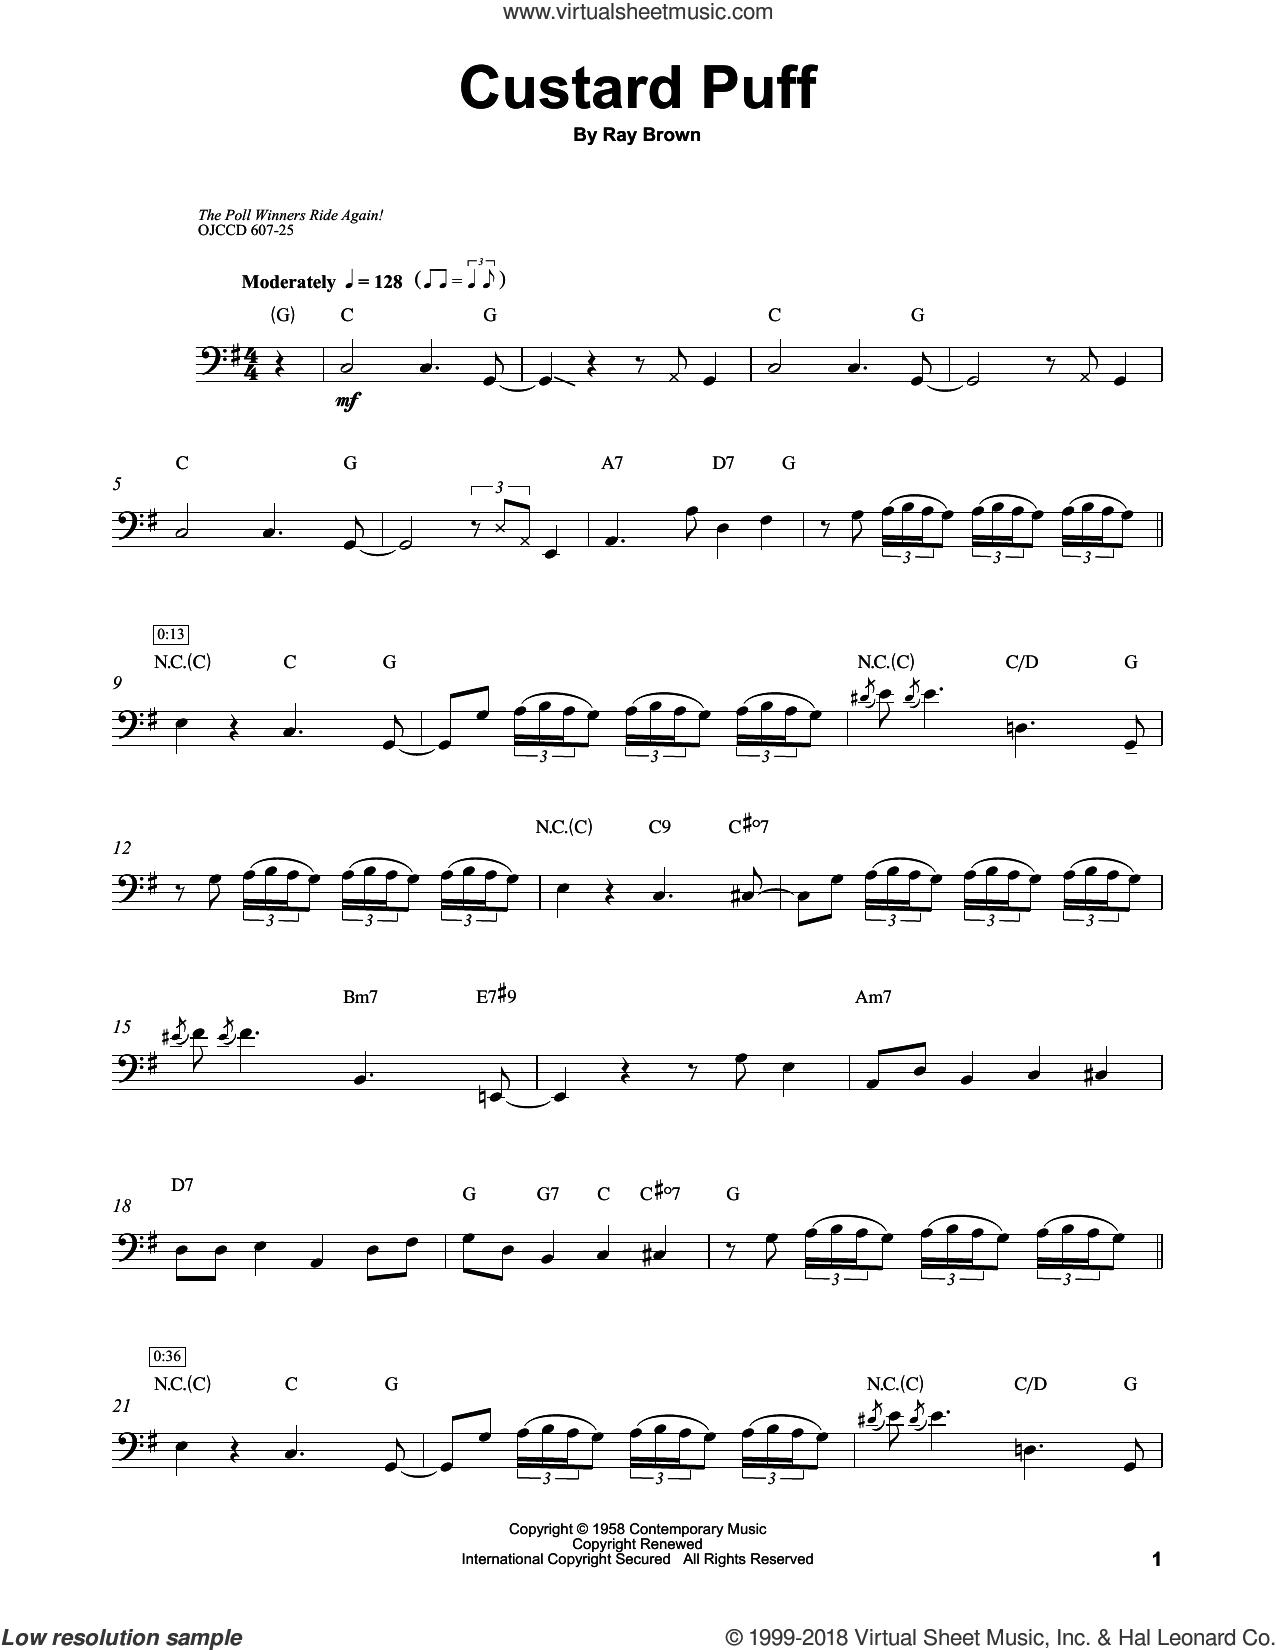 Custard Puff sheet music for brass ensemble (transcription) by Ray Brown, intermediate skill level